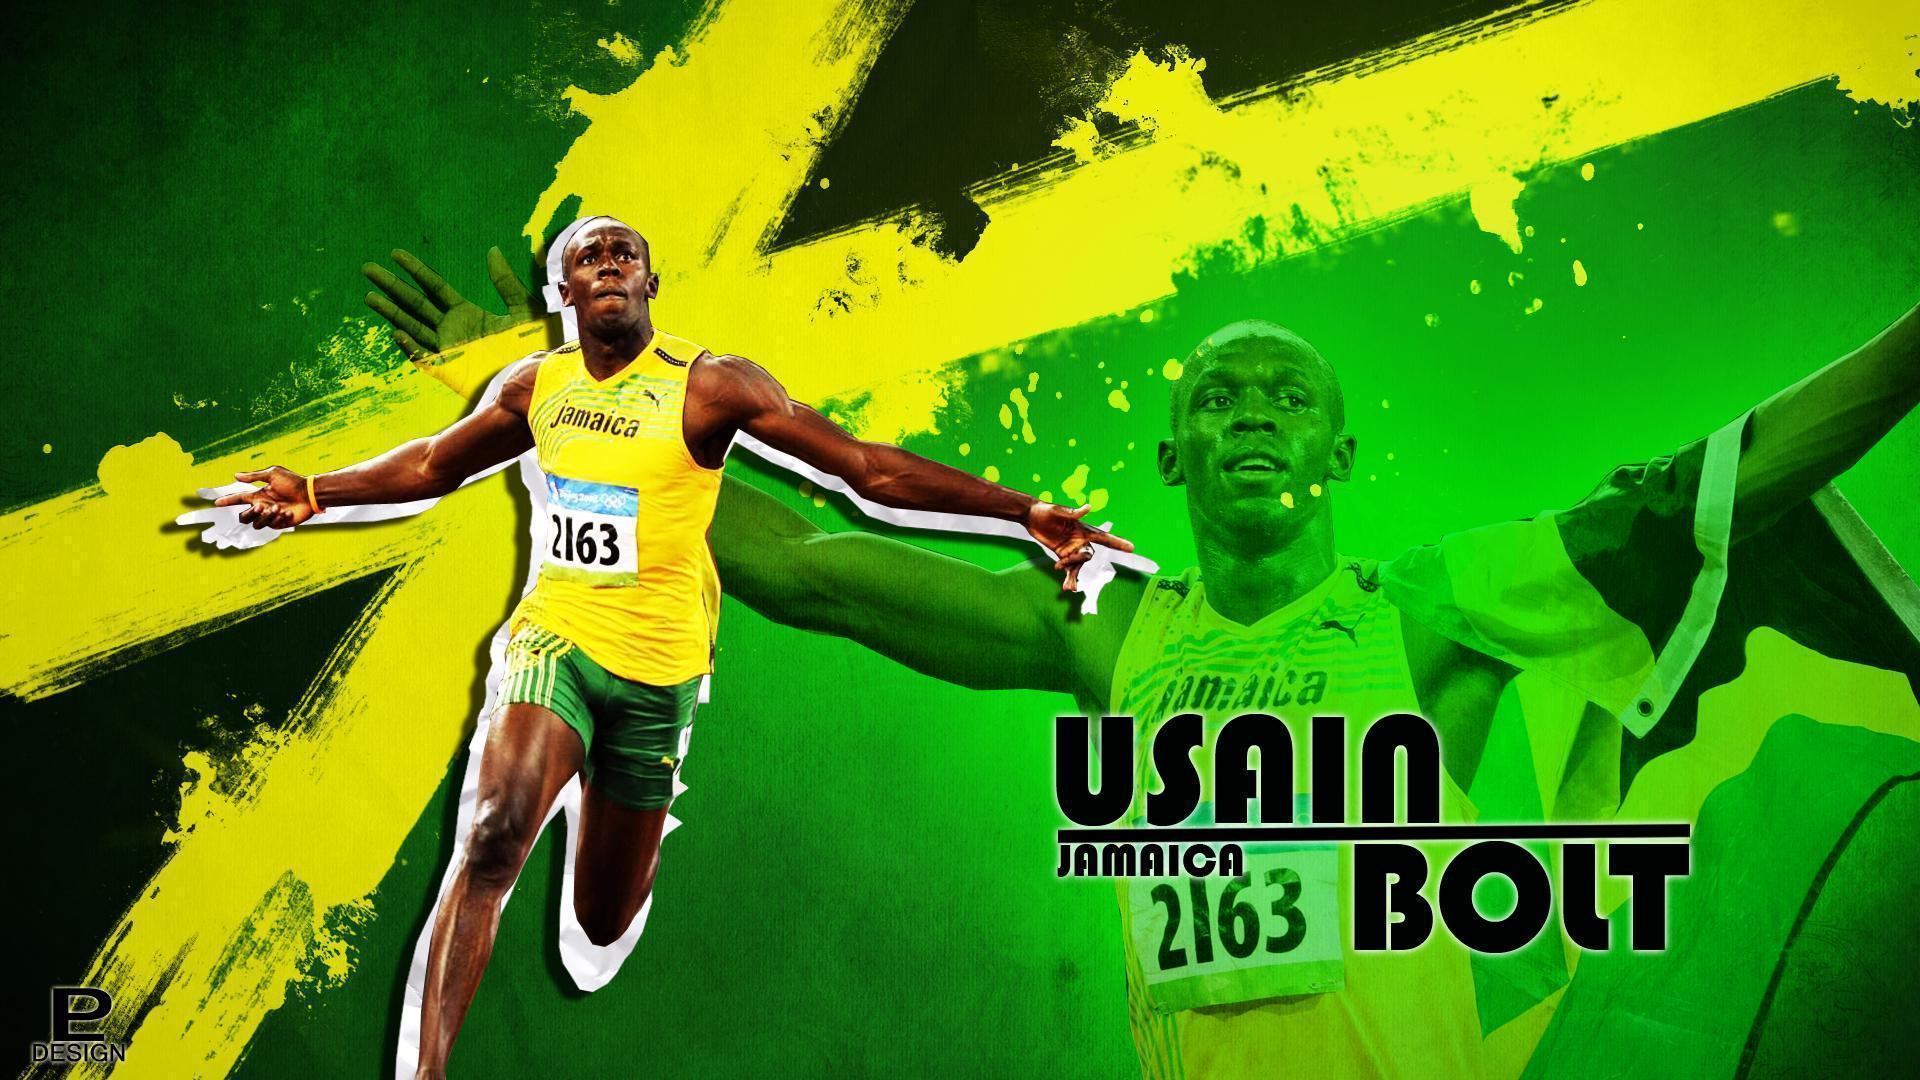 Fondos de pantalla de Usain Bolt | Wallpapers de Usain Bolt ...